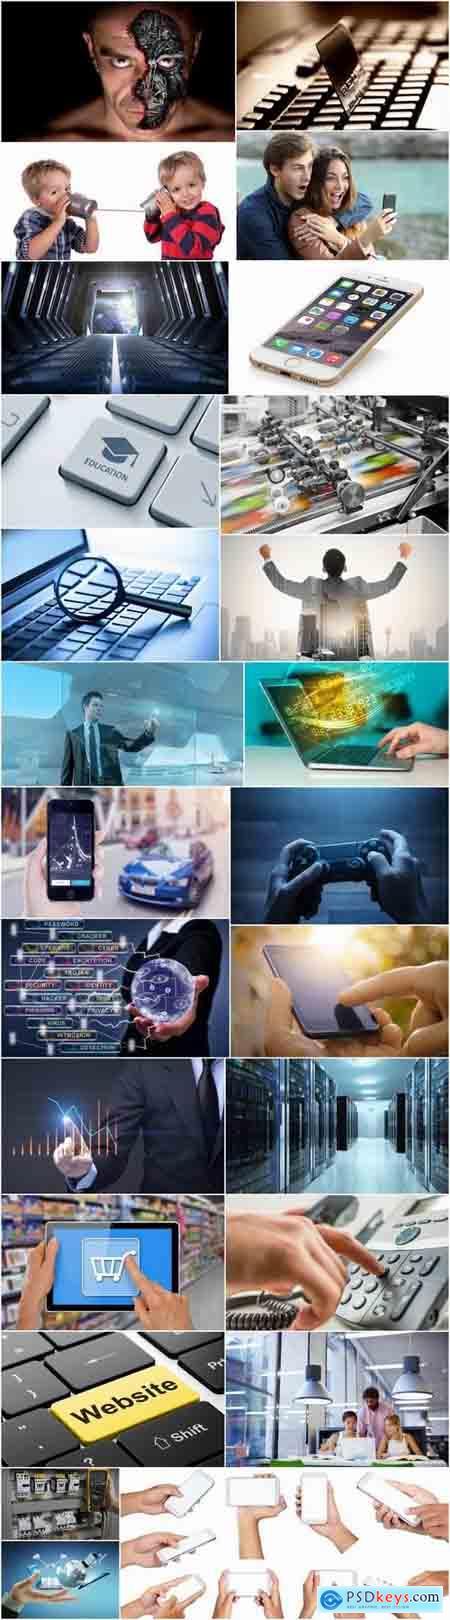 Hightech nanotechnology telemetry communication computer connection 25 HQ Jpeg